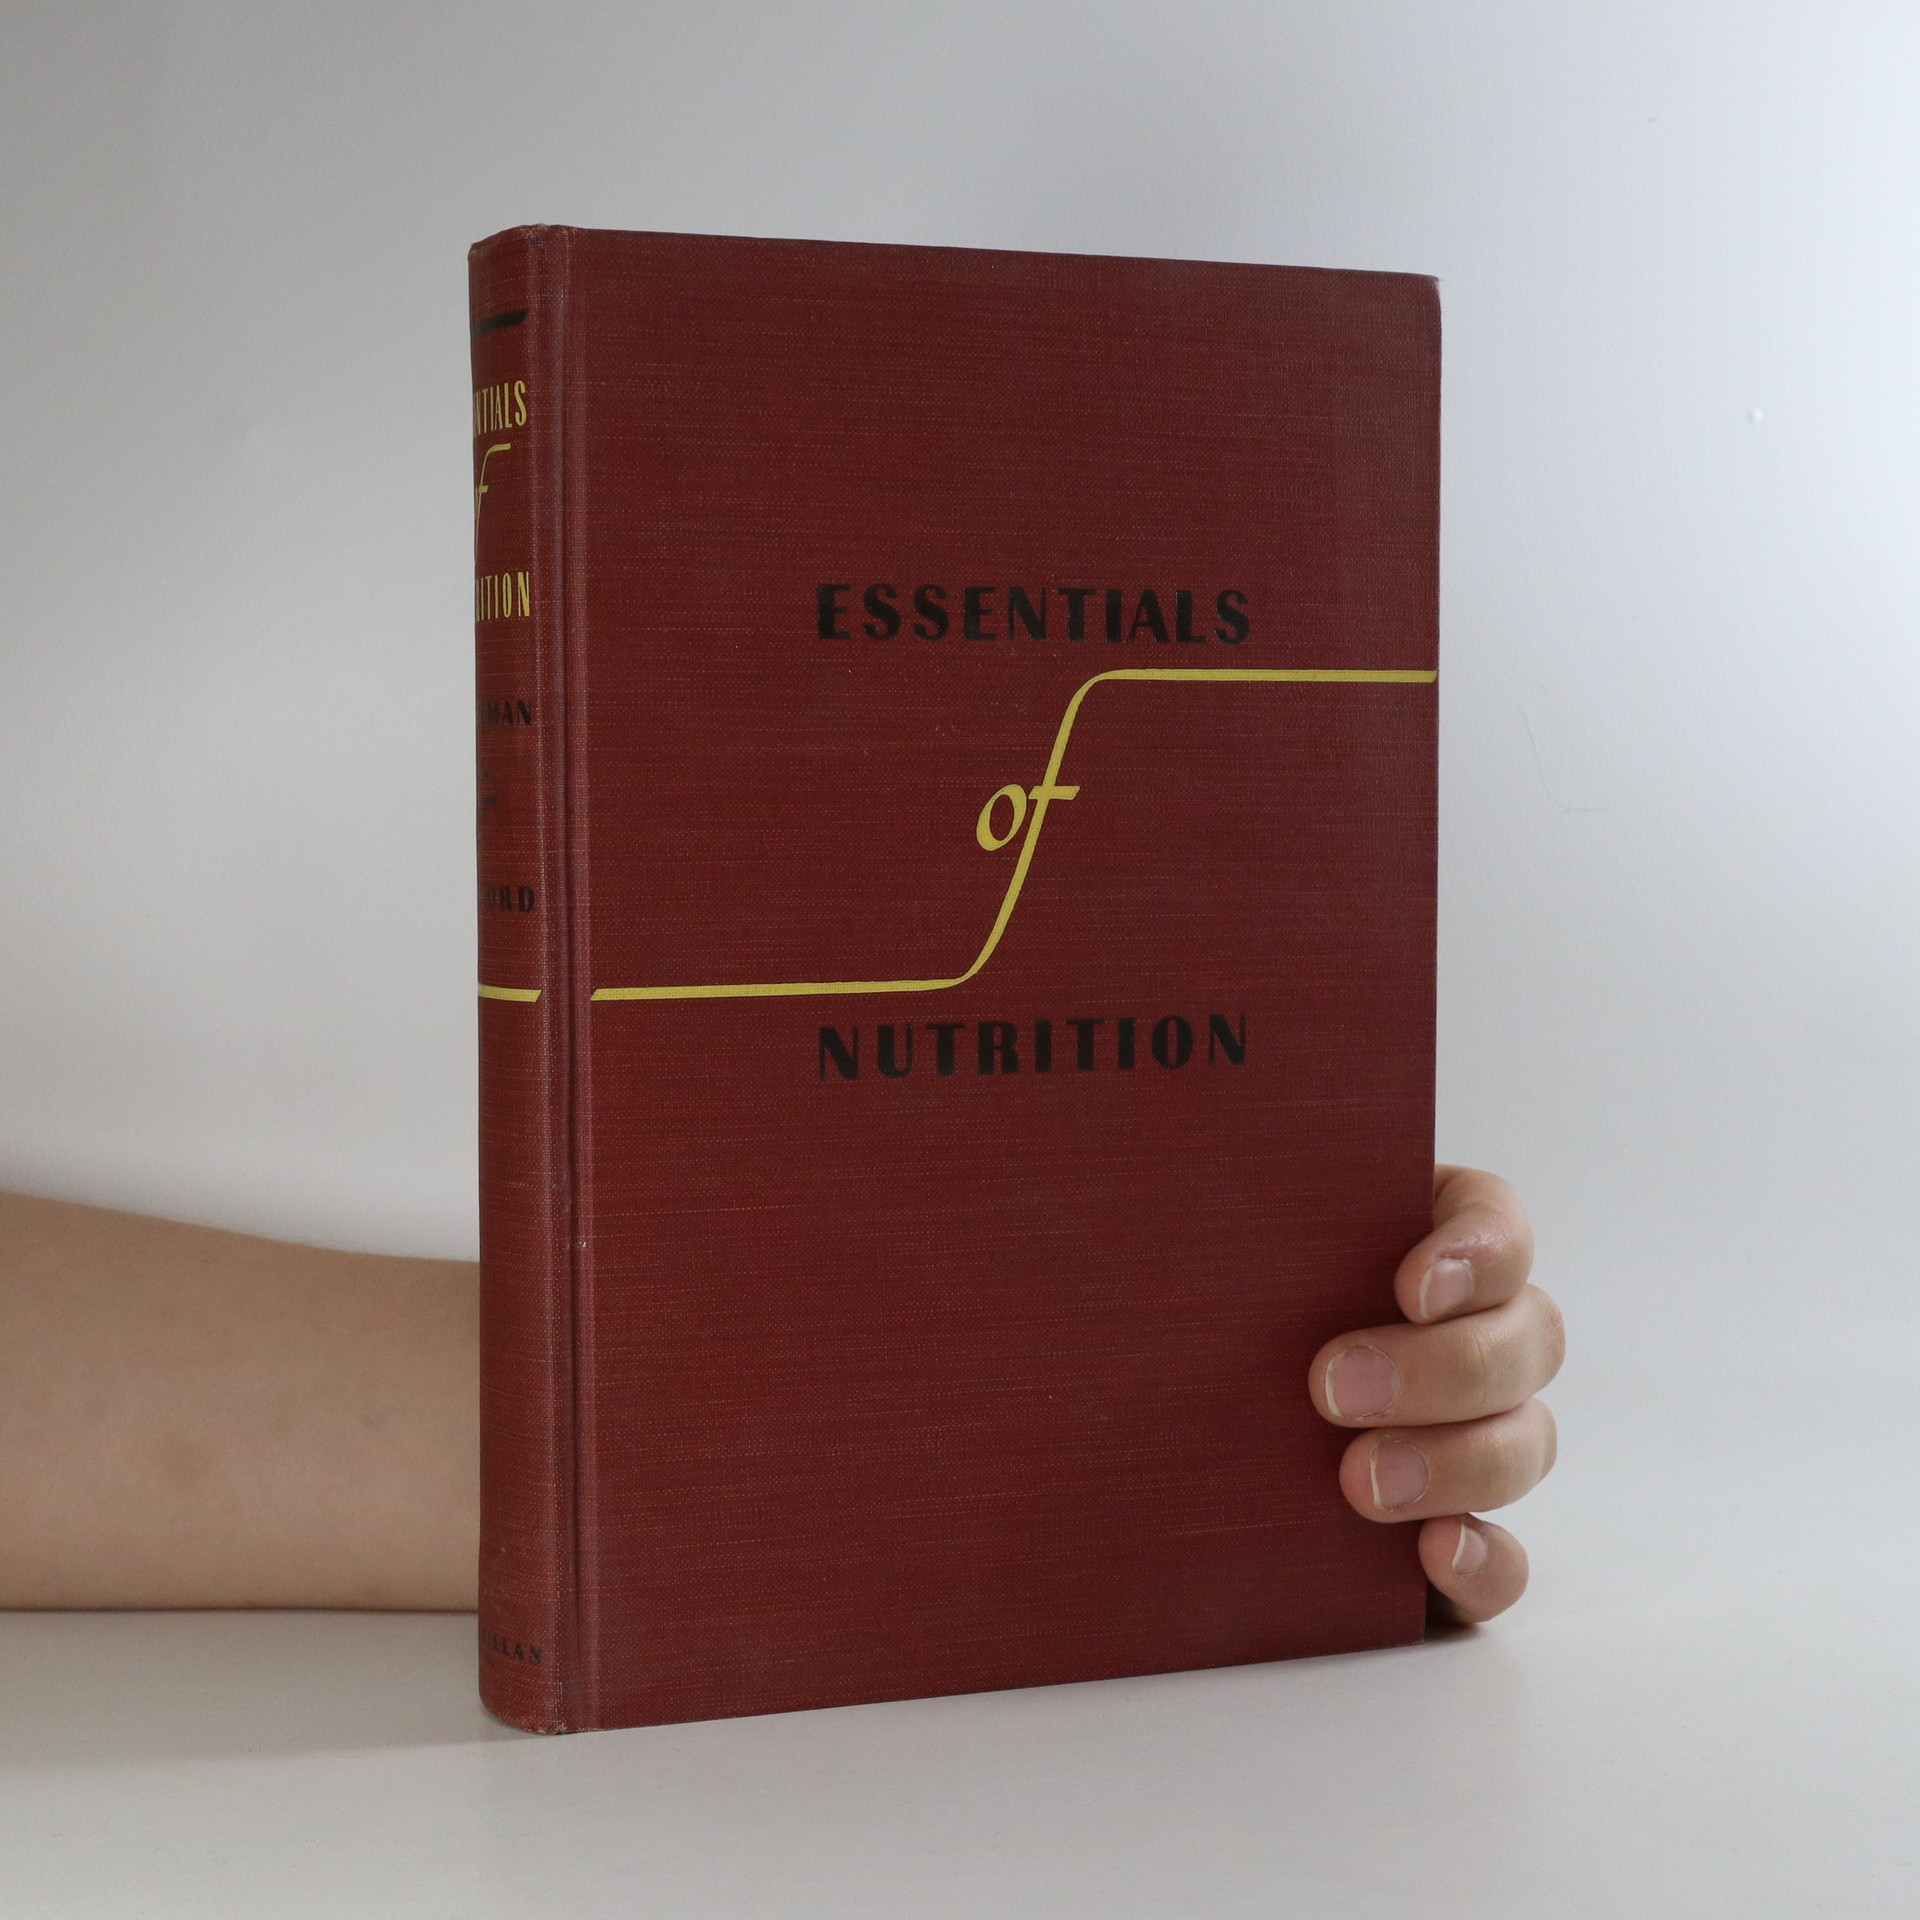 antikvární kniha Essentials of nutrition, 1943